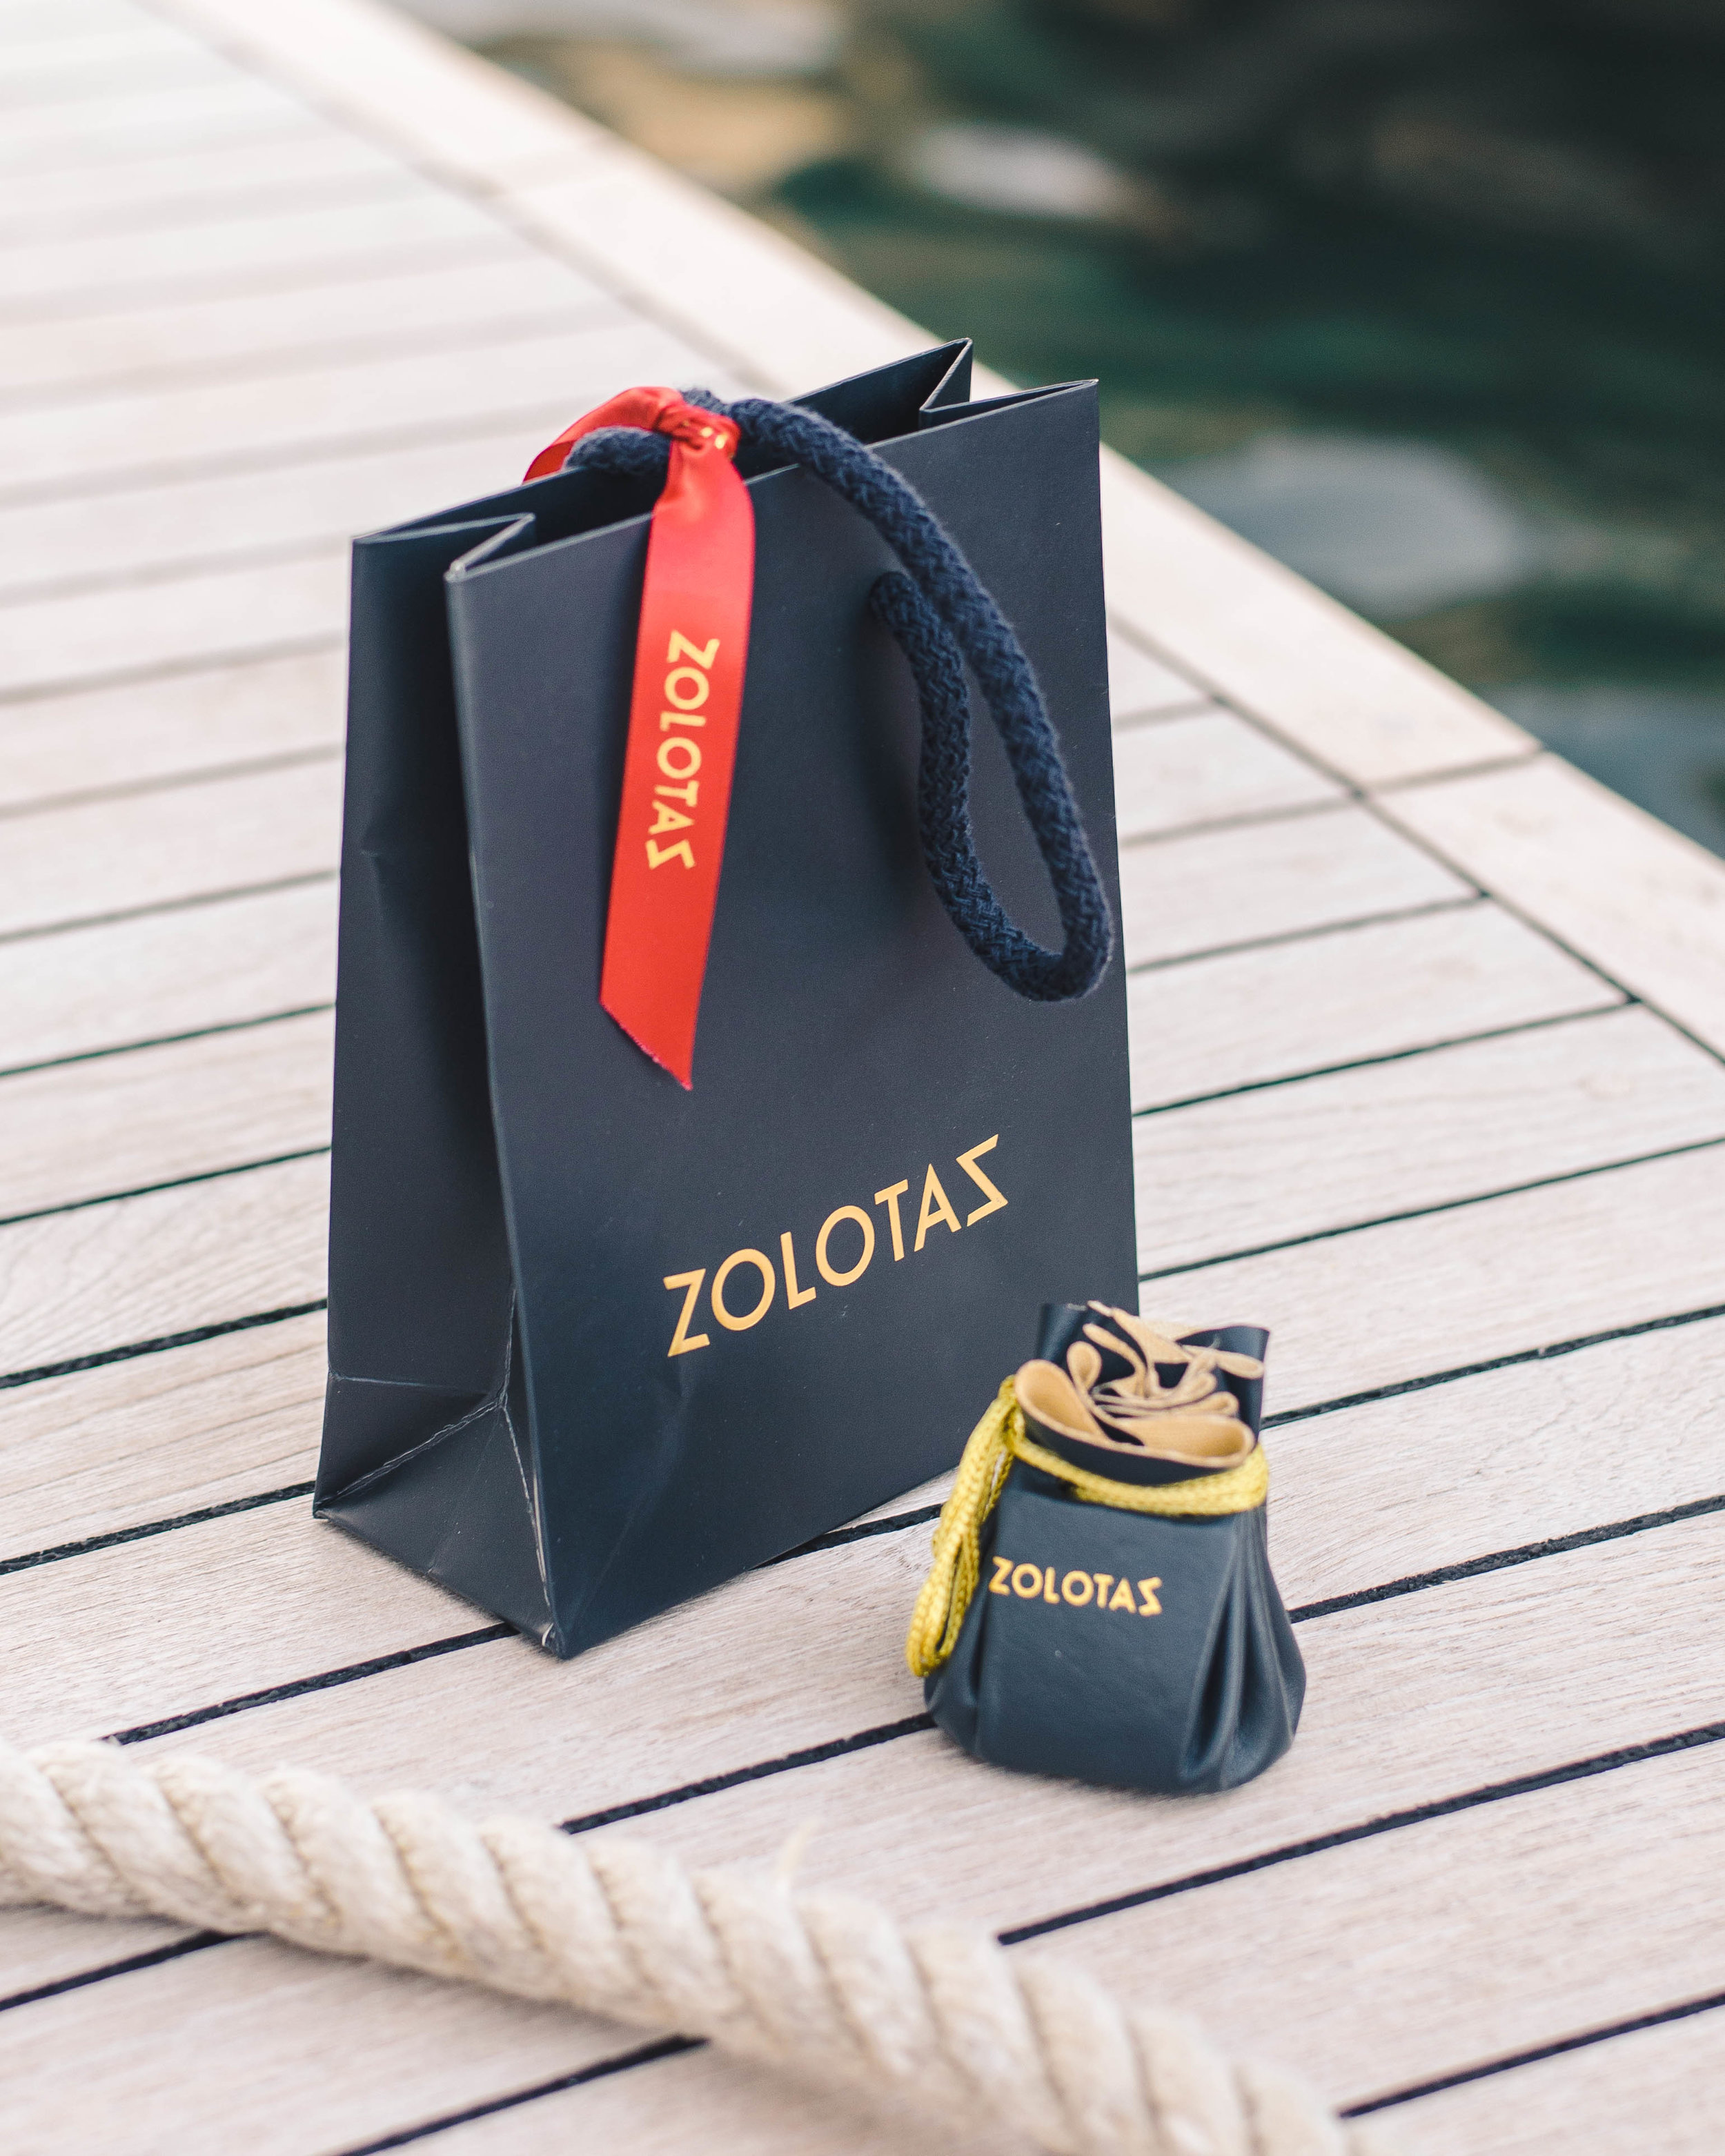 AEOLOS | ZOLOTAS 2018 charm